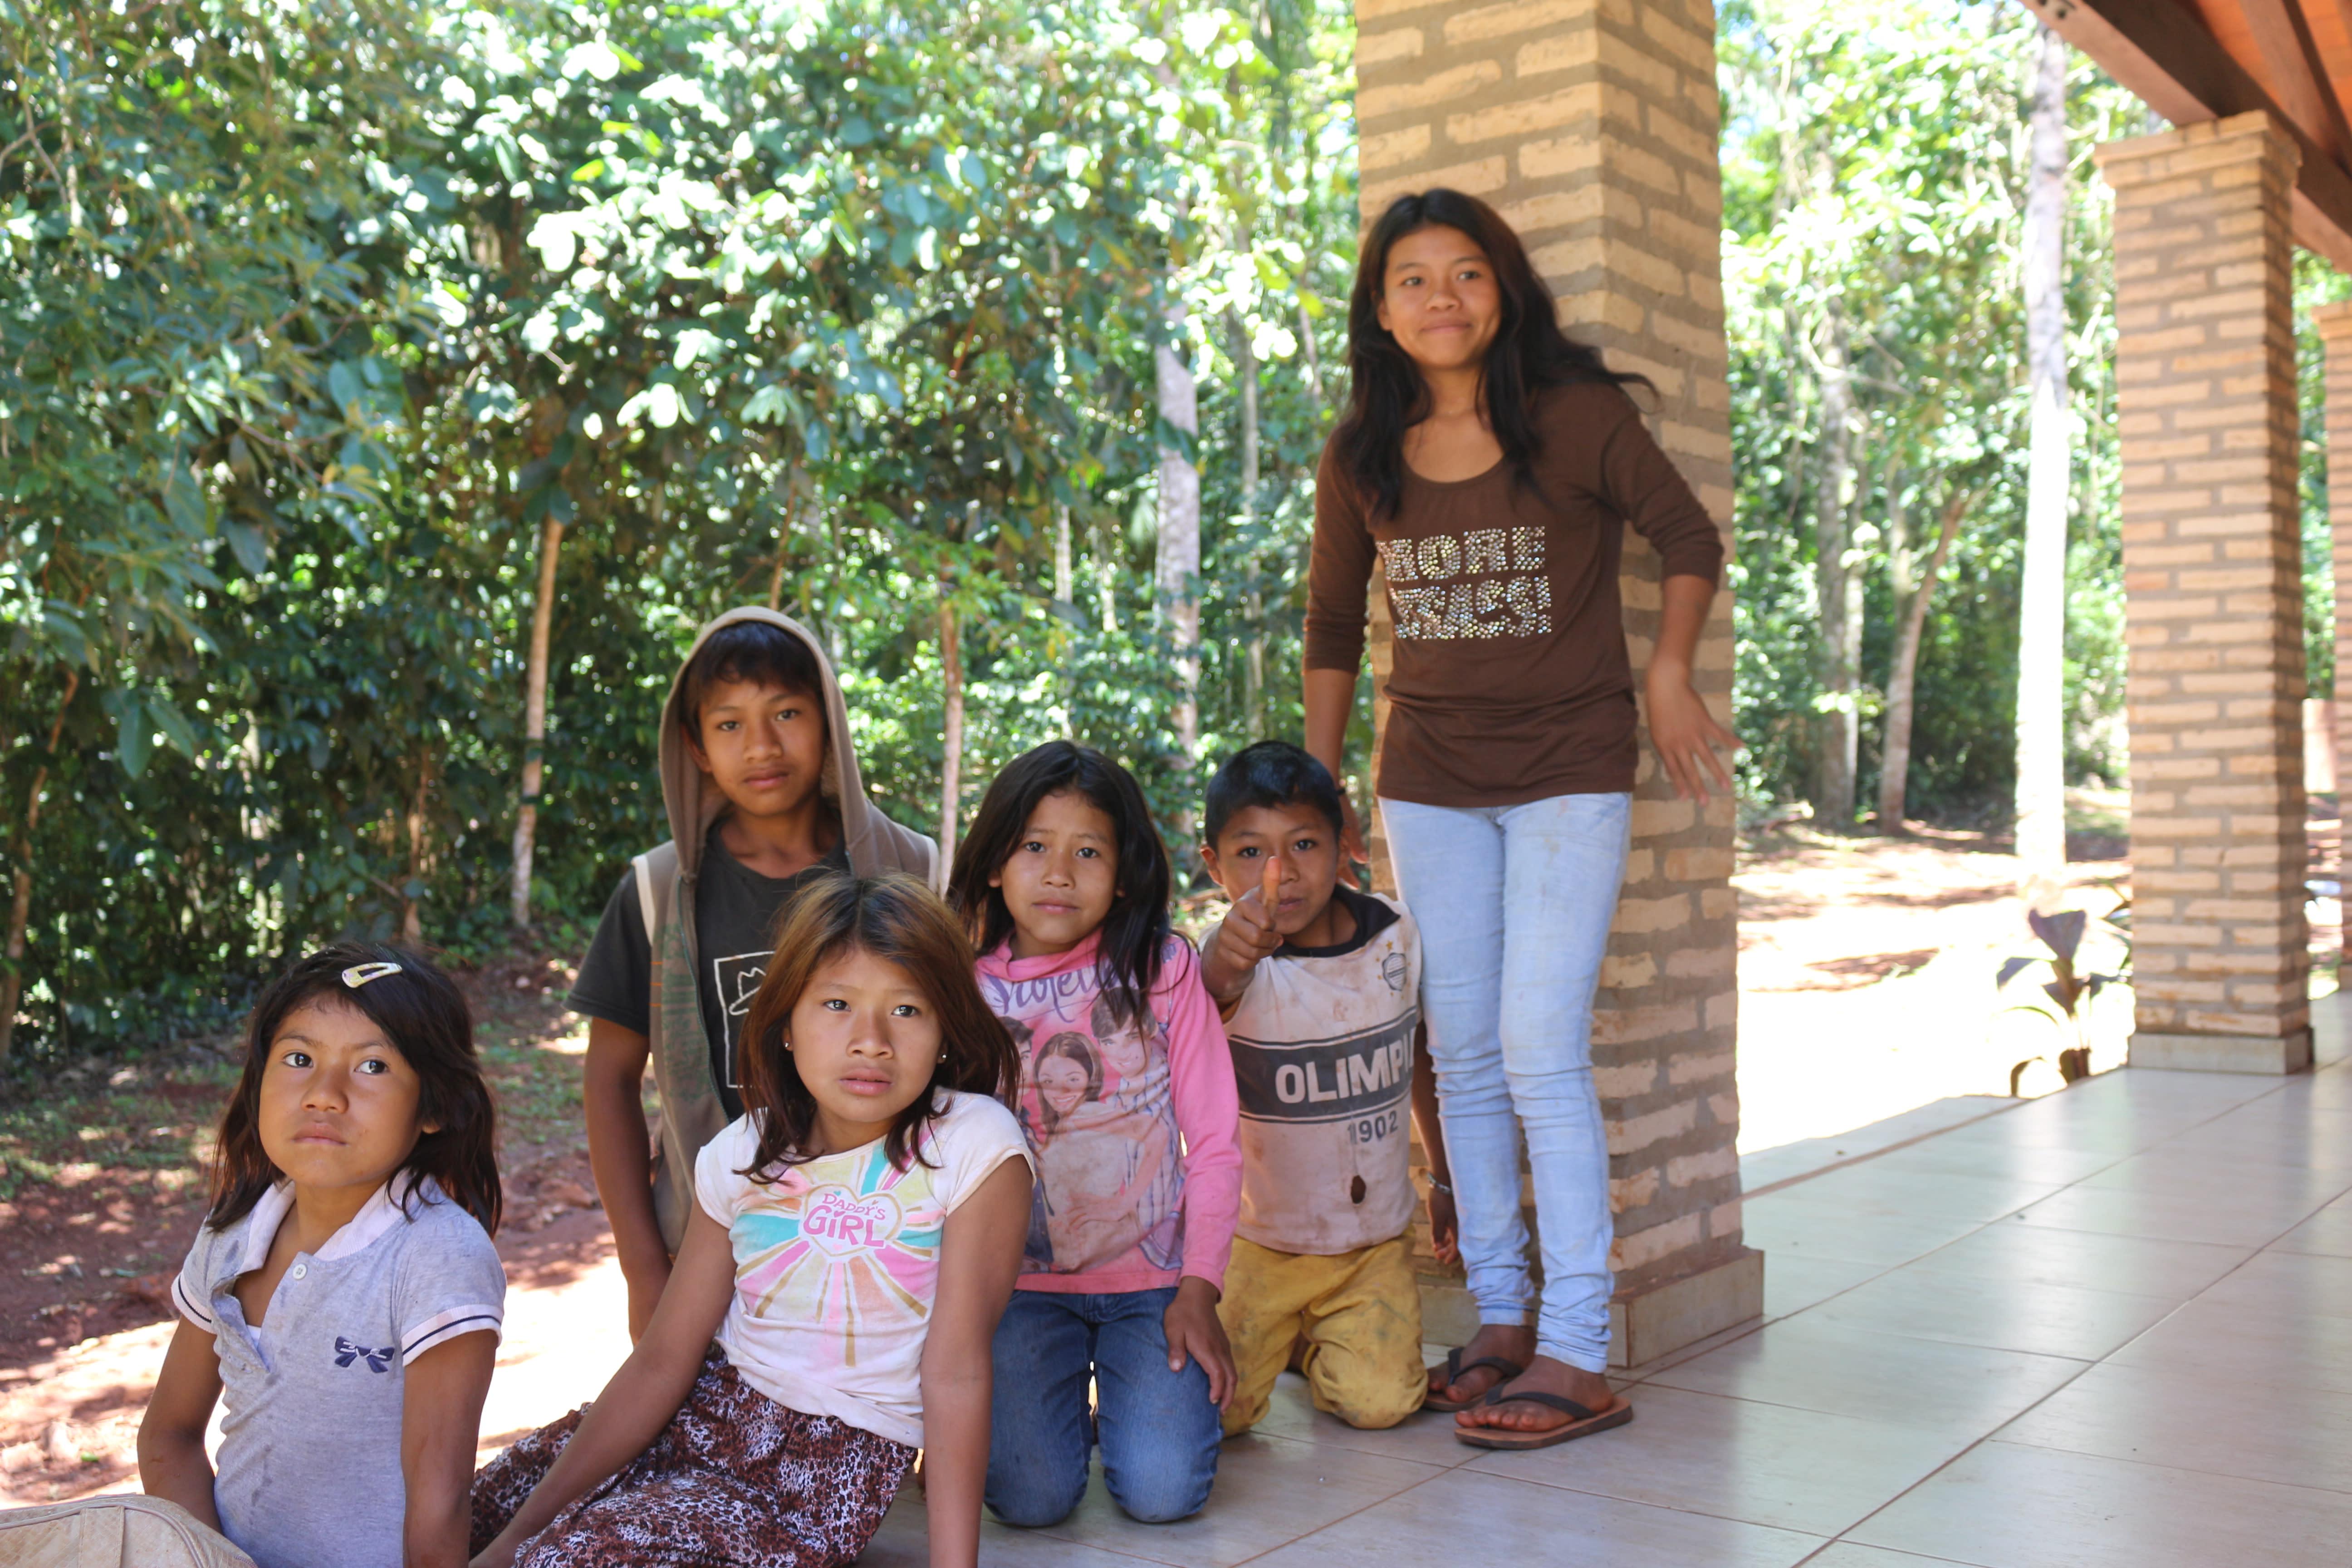 Local Guarani native children outside the Moise Bertoni Museum (ANNA AHRONHEIM)